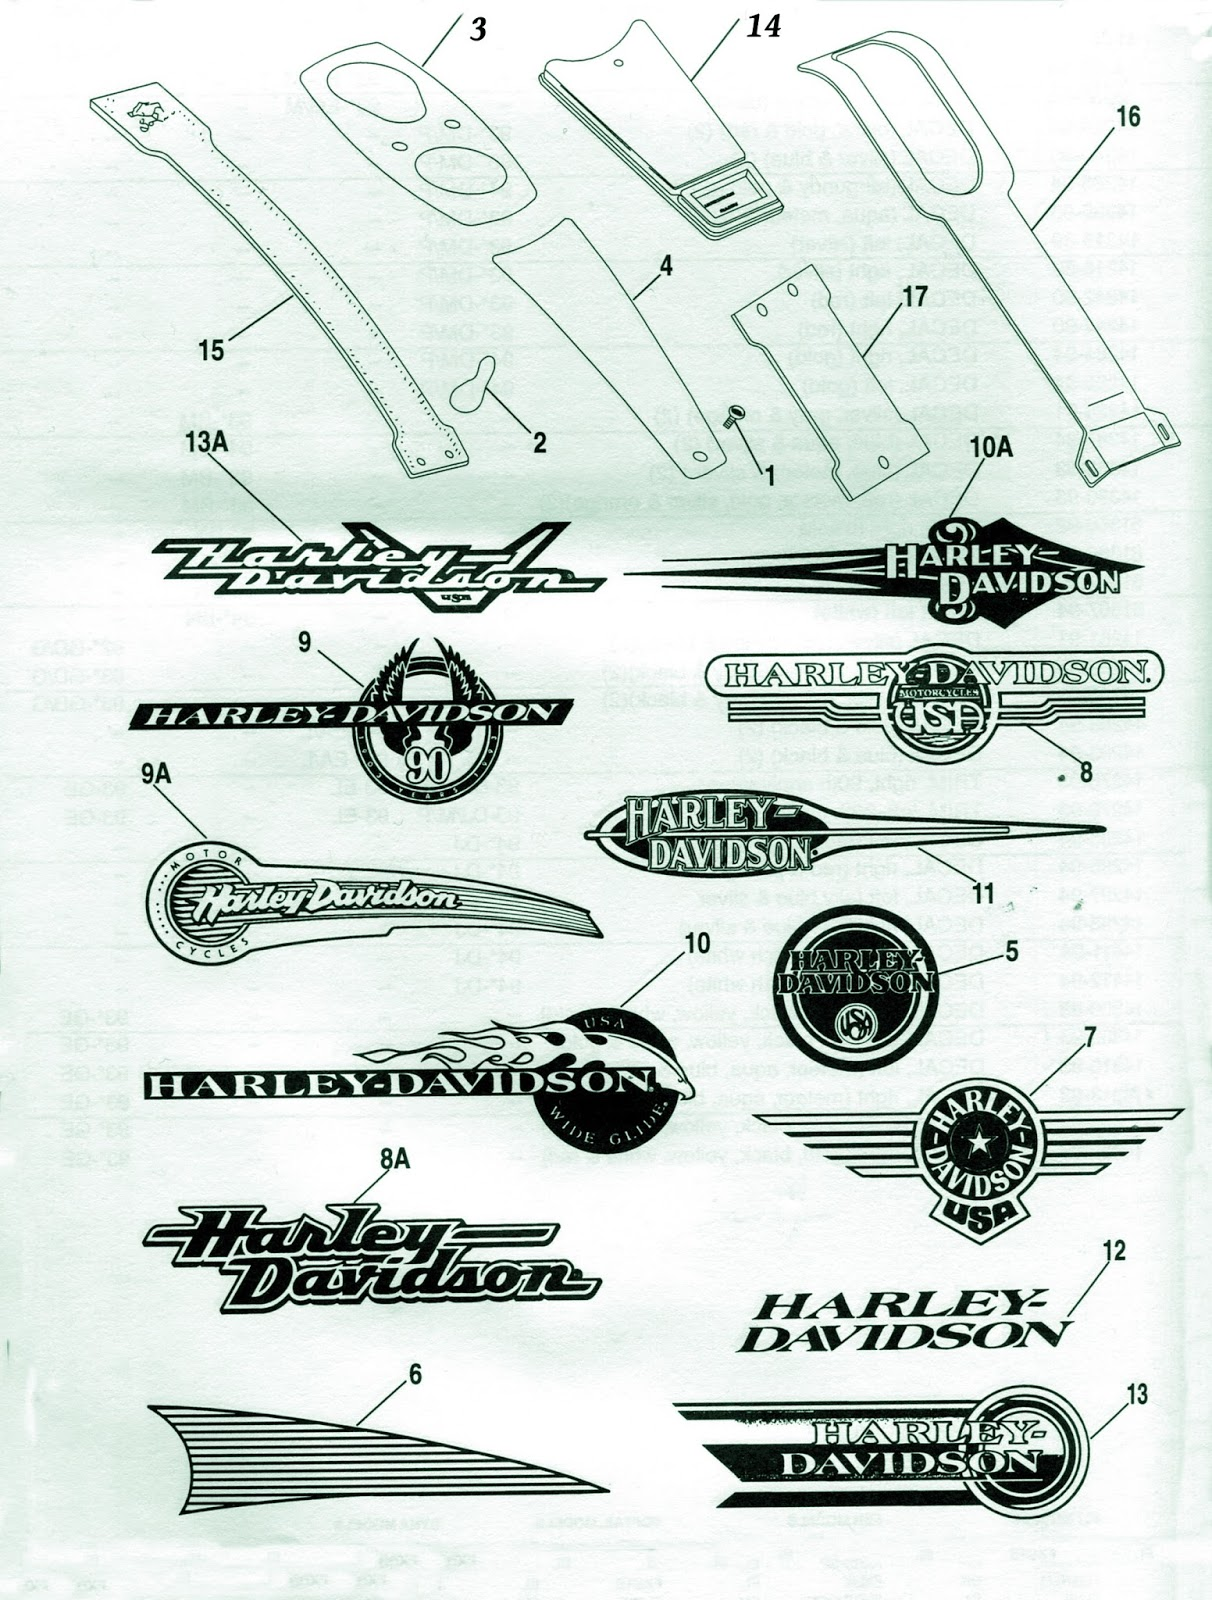 tech files 1993 94 harley davidson carb diagrams fuel tank logos [ 1212 x 1600 Pixel ]